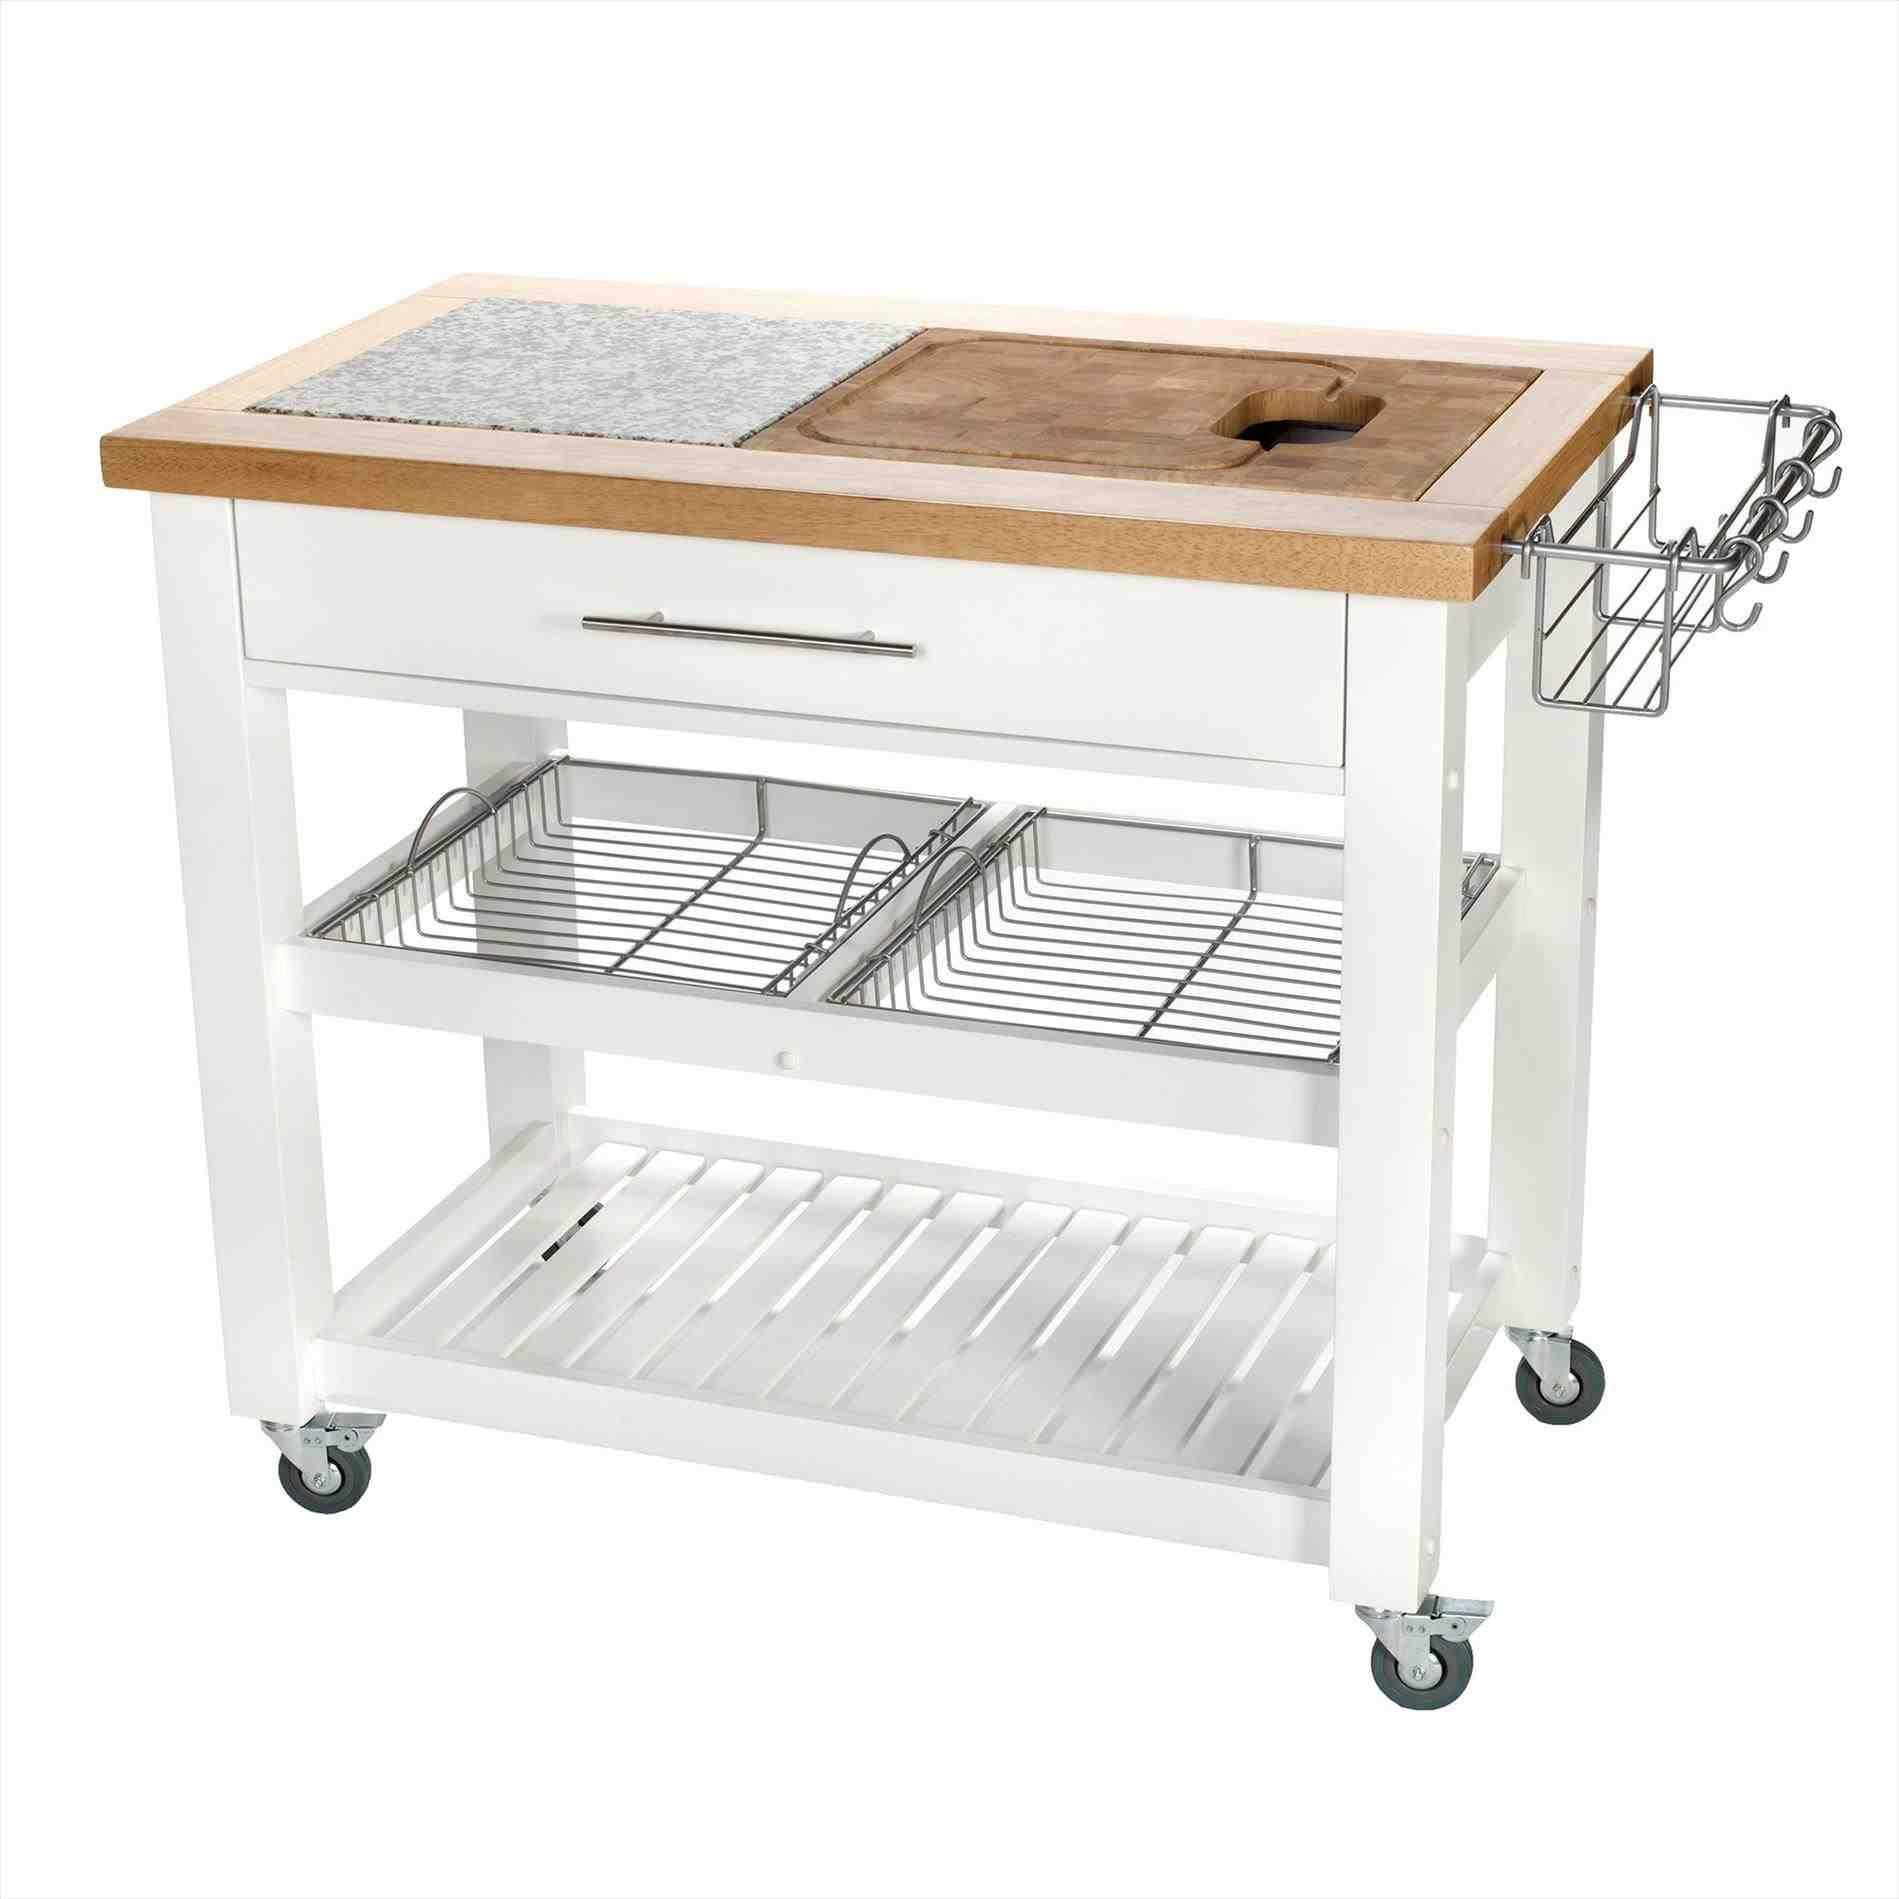 New Post commercial kitchen cart | Decors Ideas | Pinterest ...